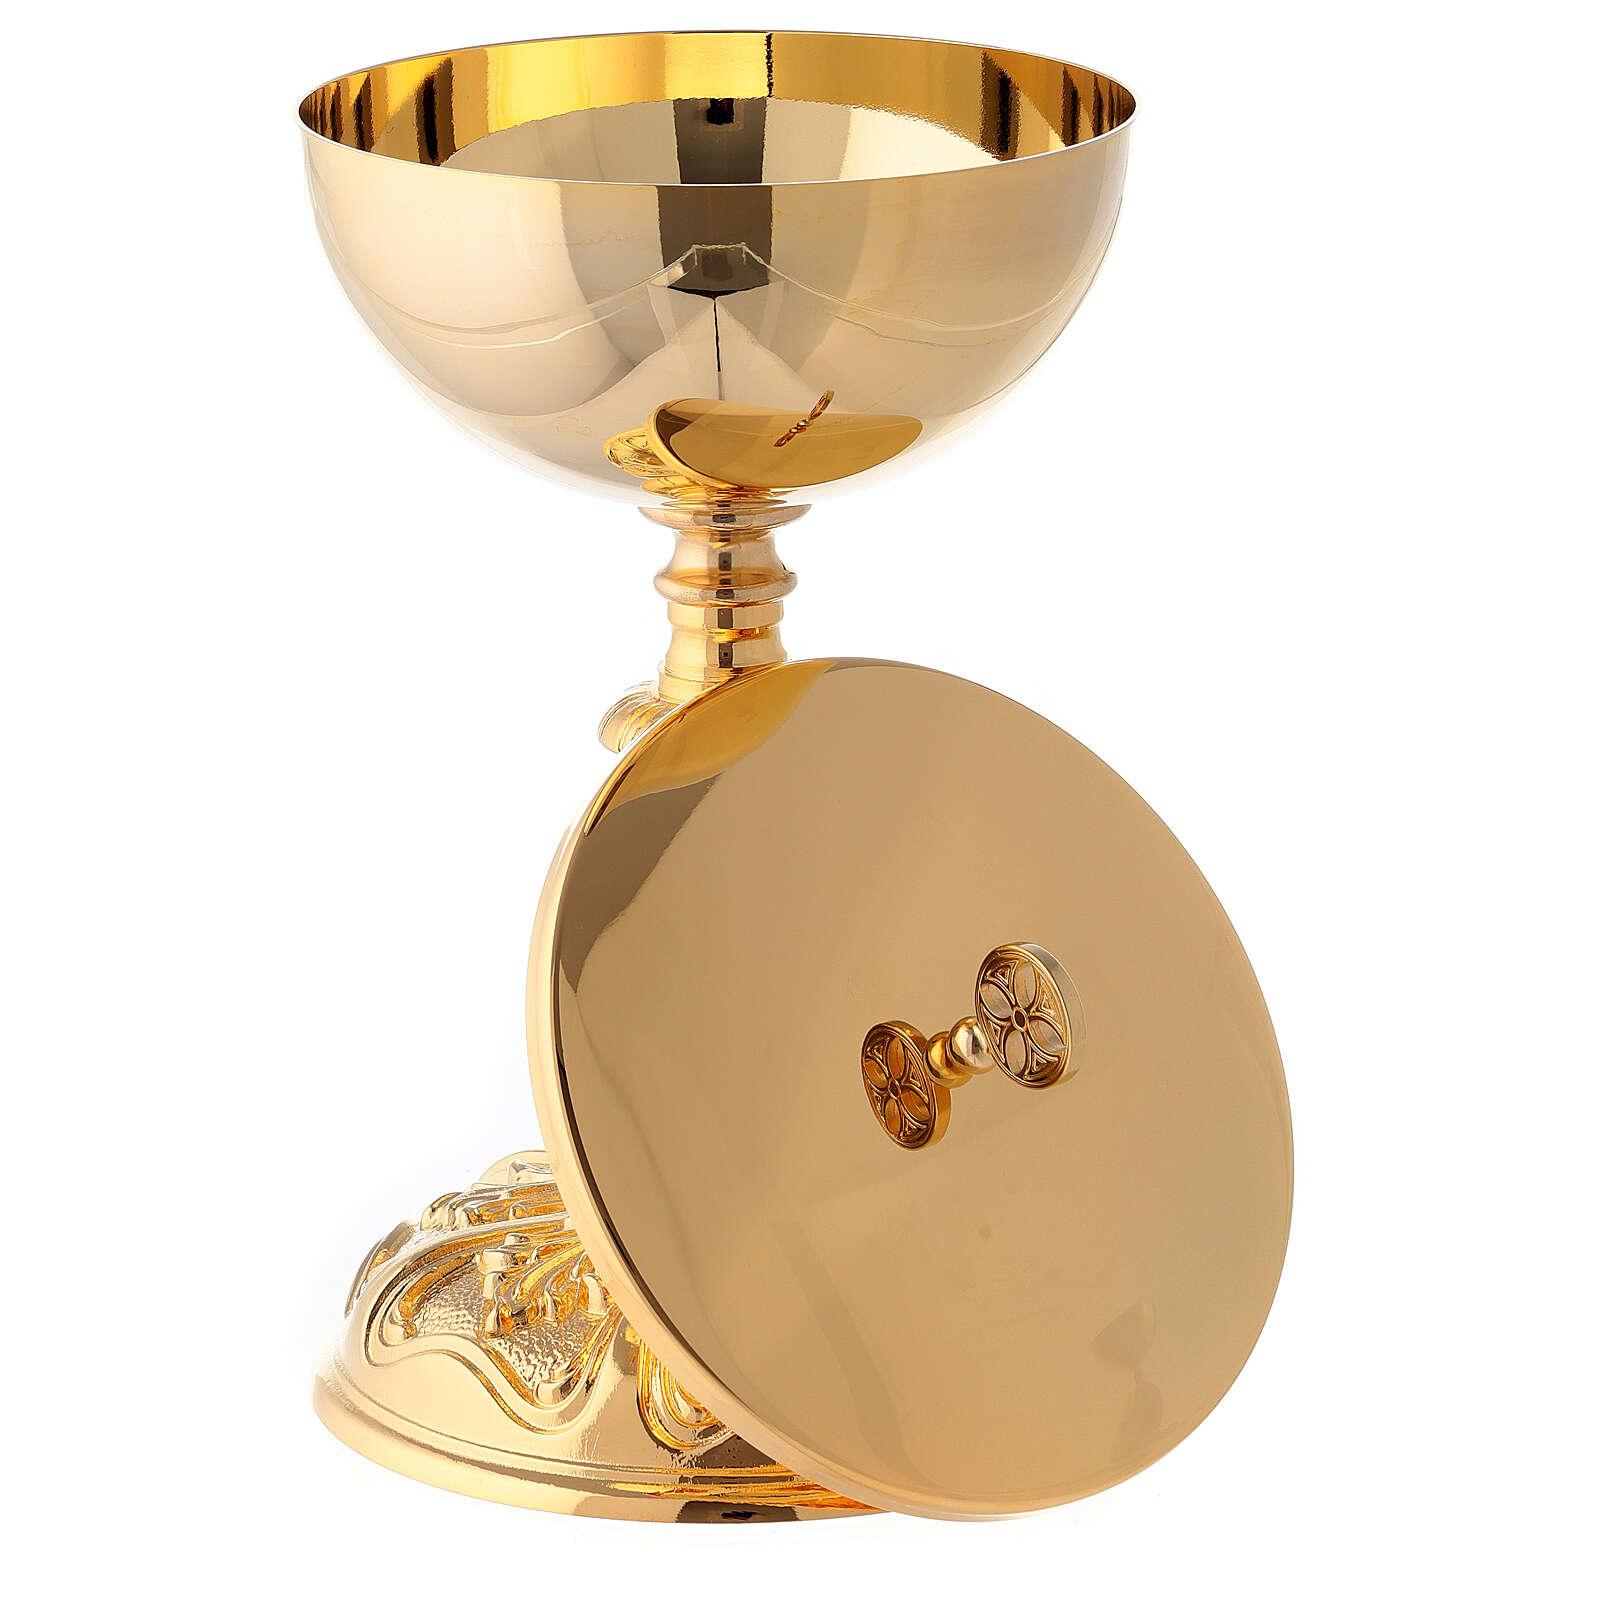 Rococo chalice and ciborium in 24-karat gold plated brass 4